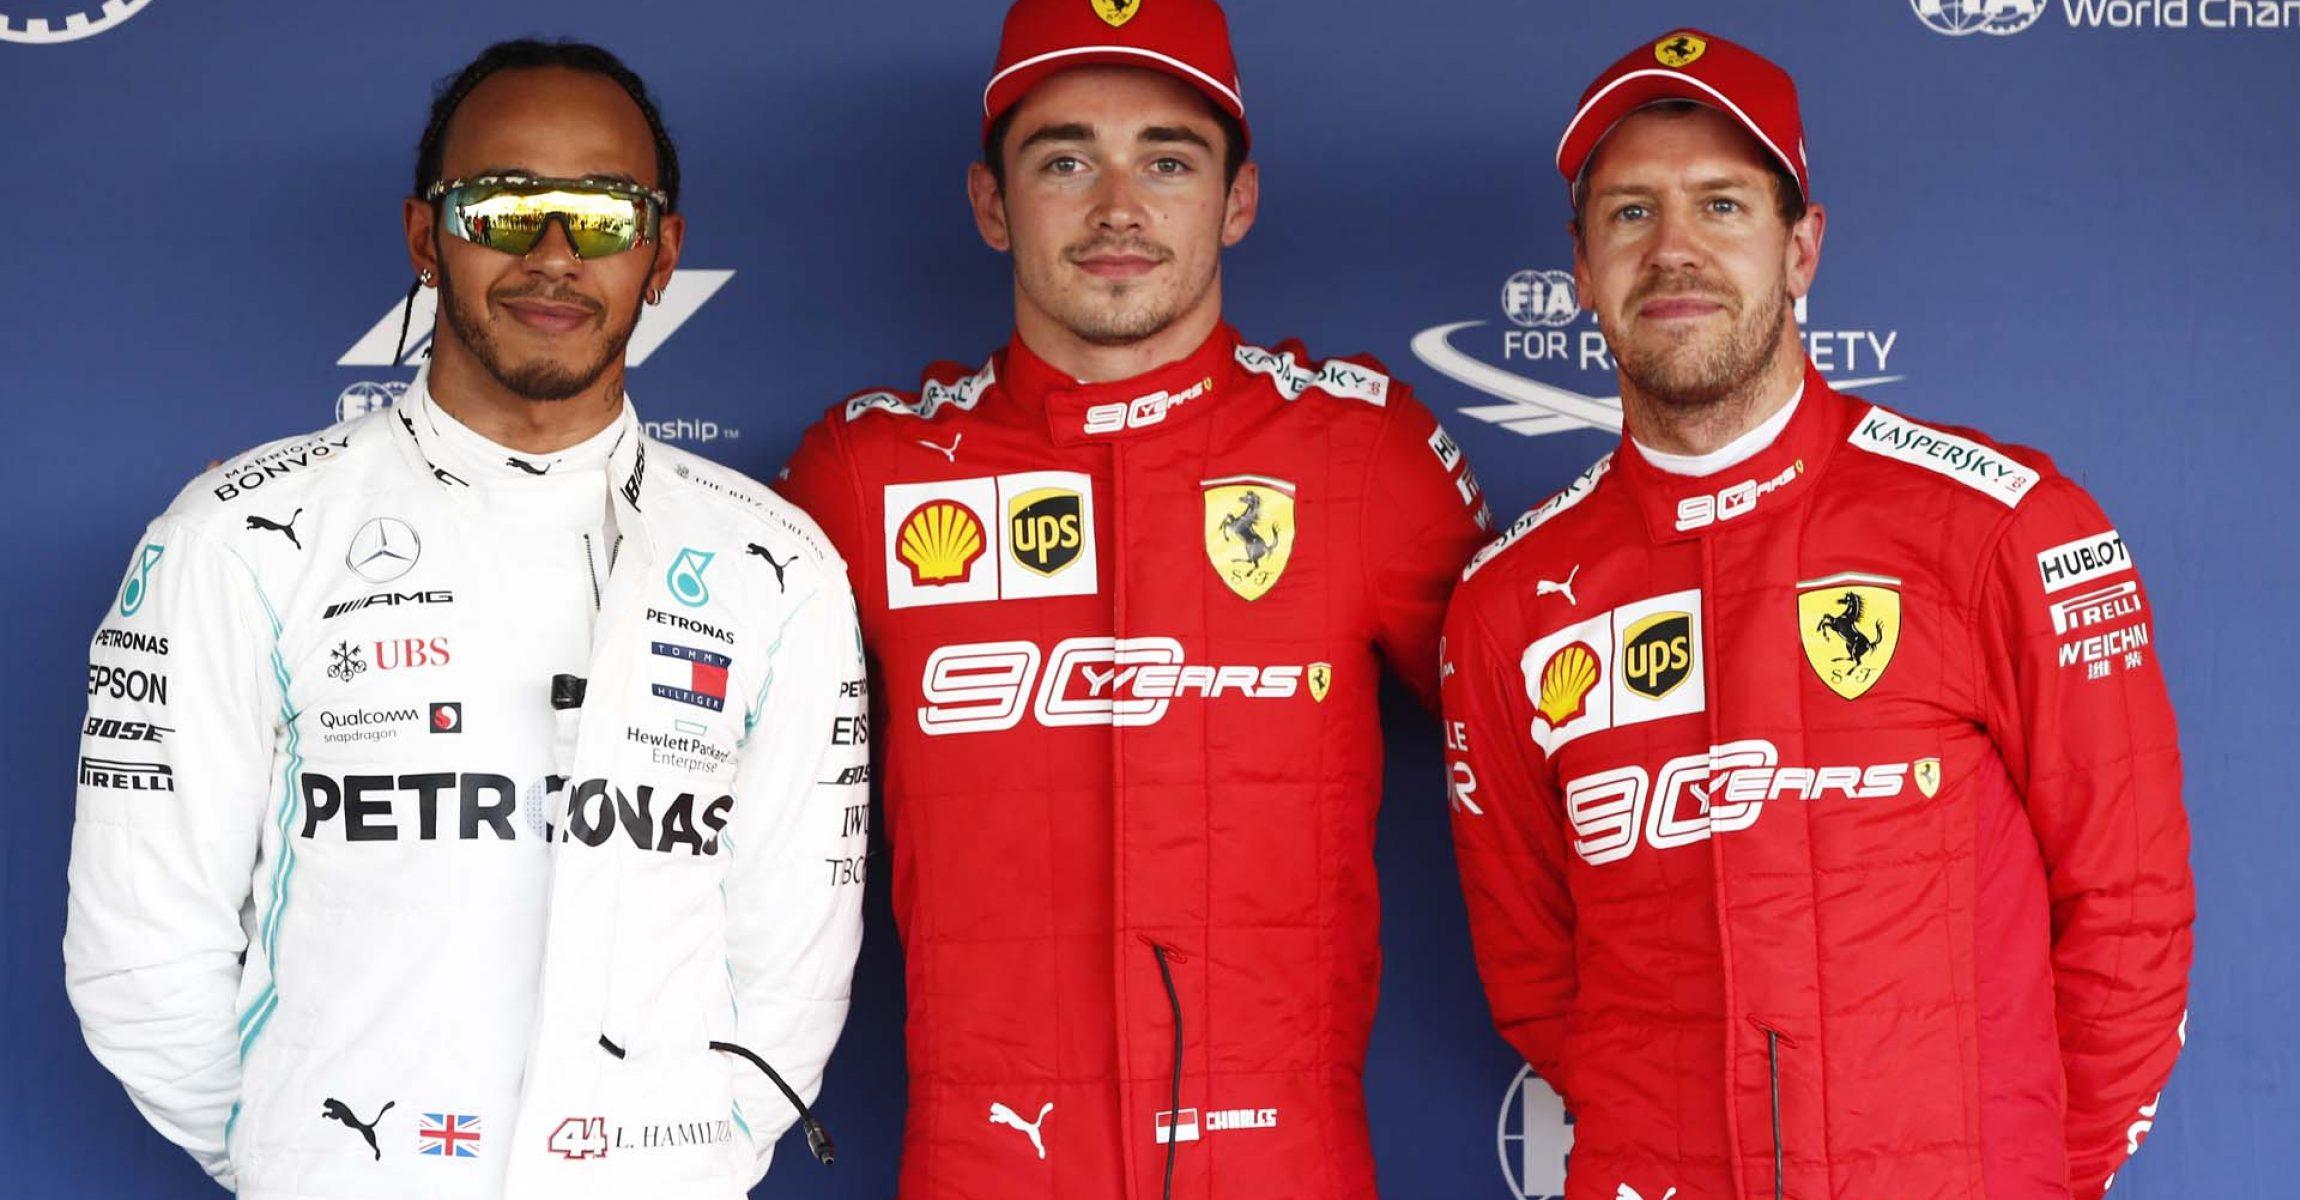 2019 Russian Grand Prix, Saturday - LAT Images Lewis Hamilton, Charles Leclerc, Sebastian Vettel